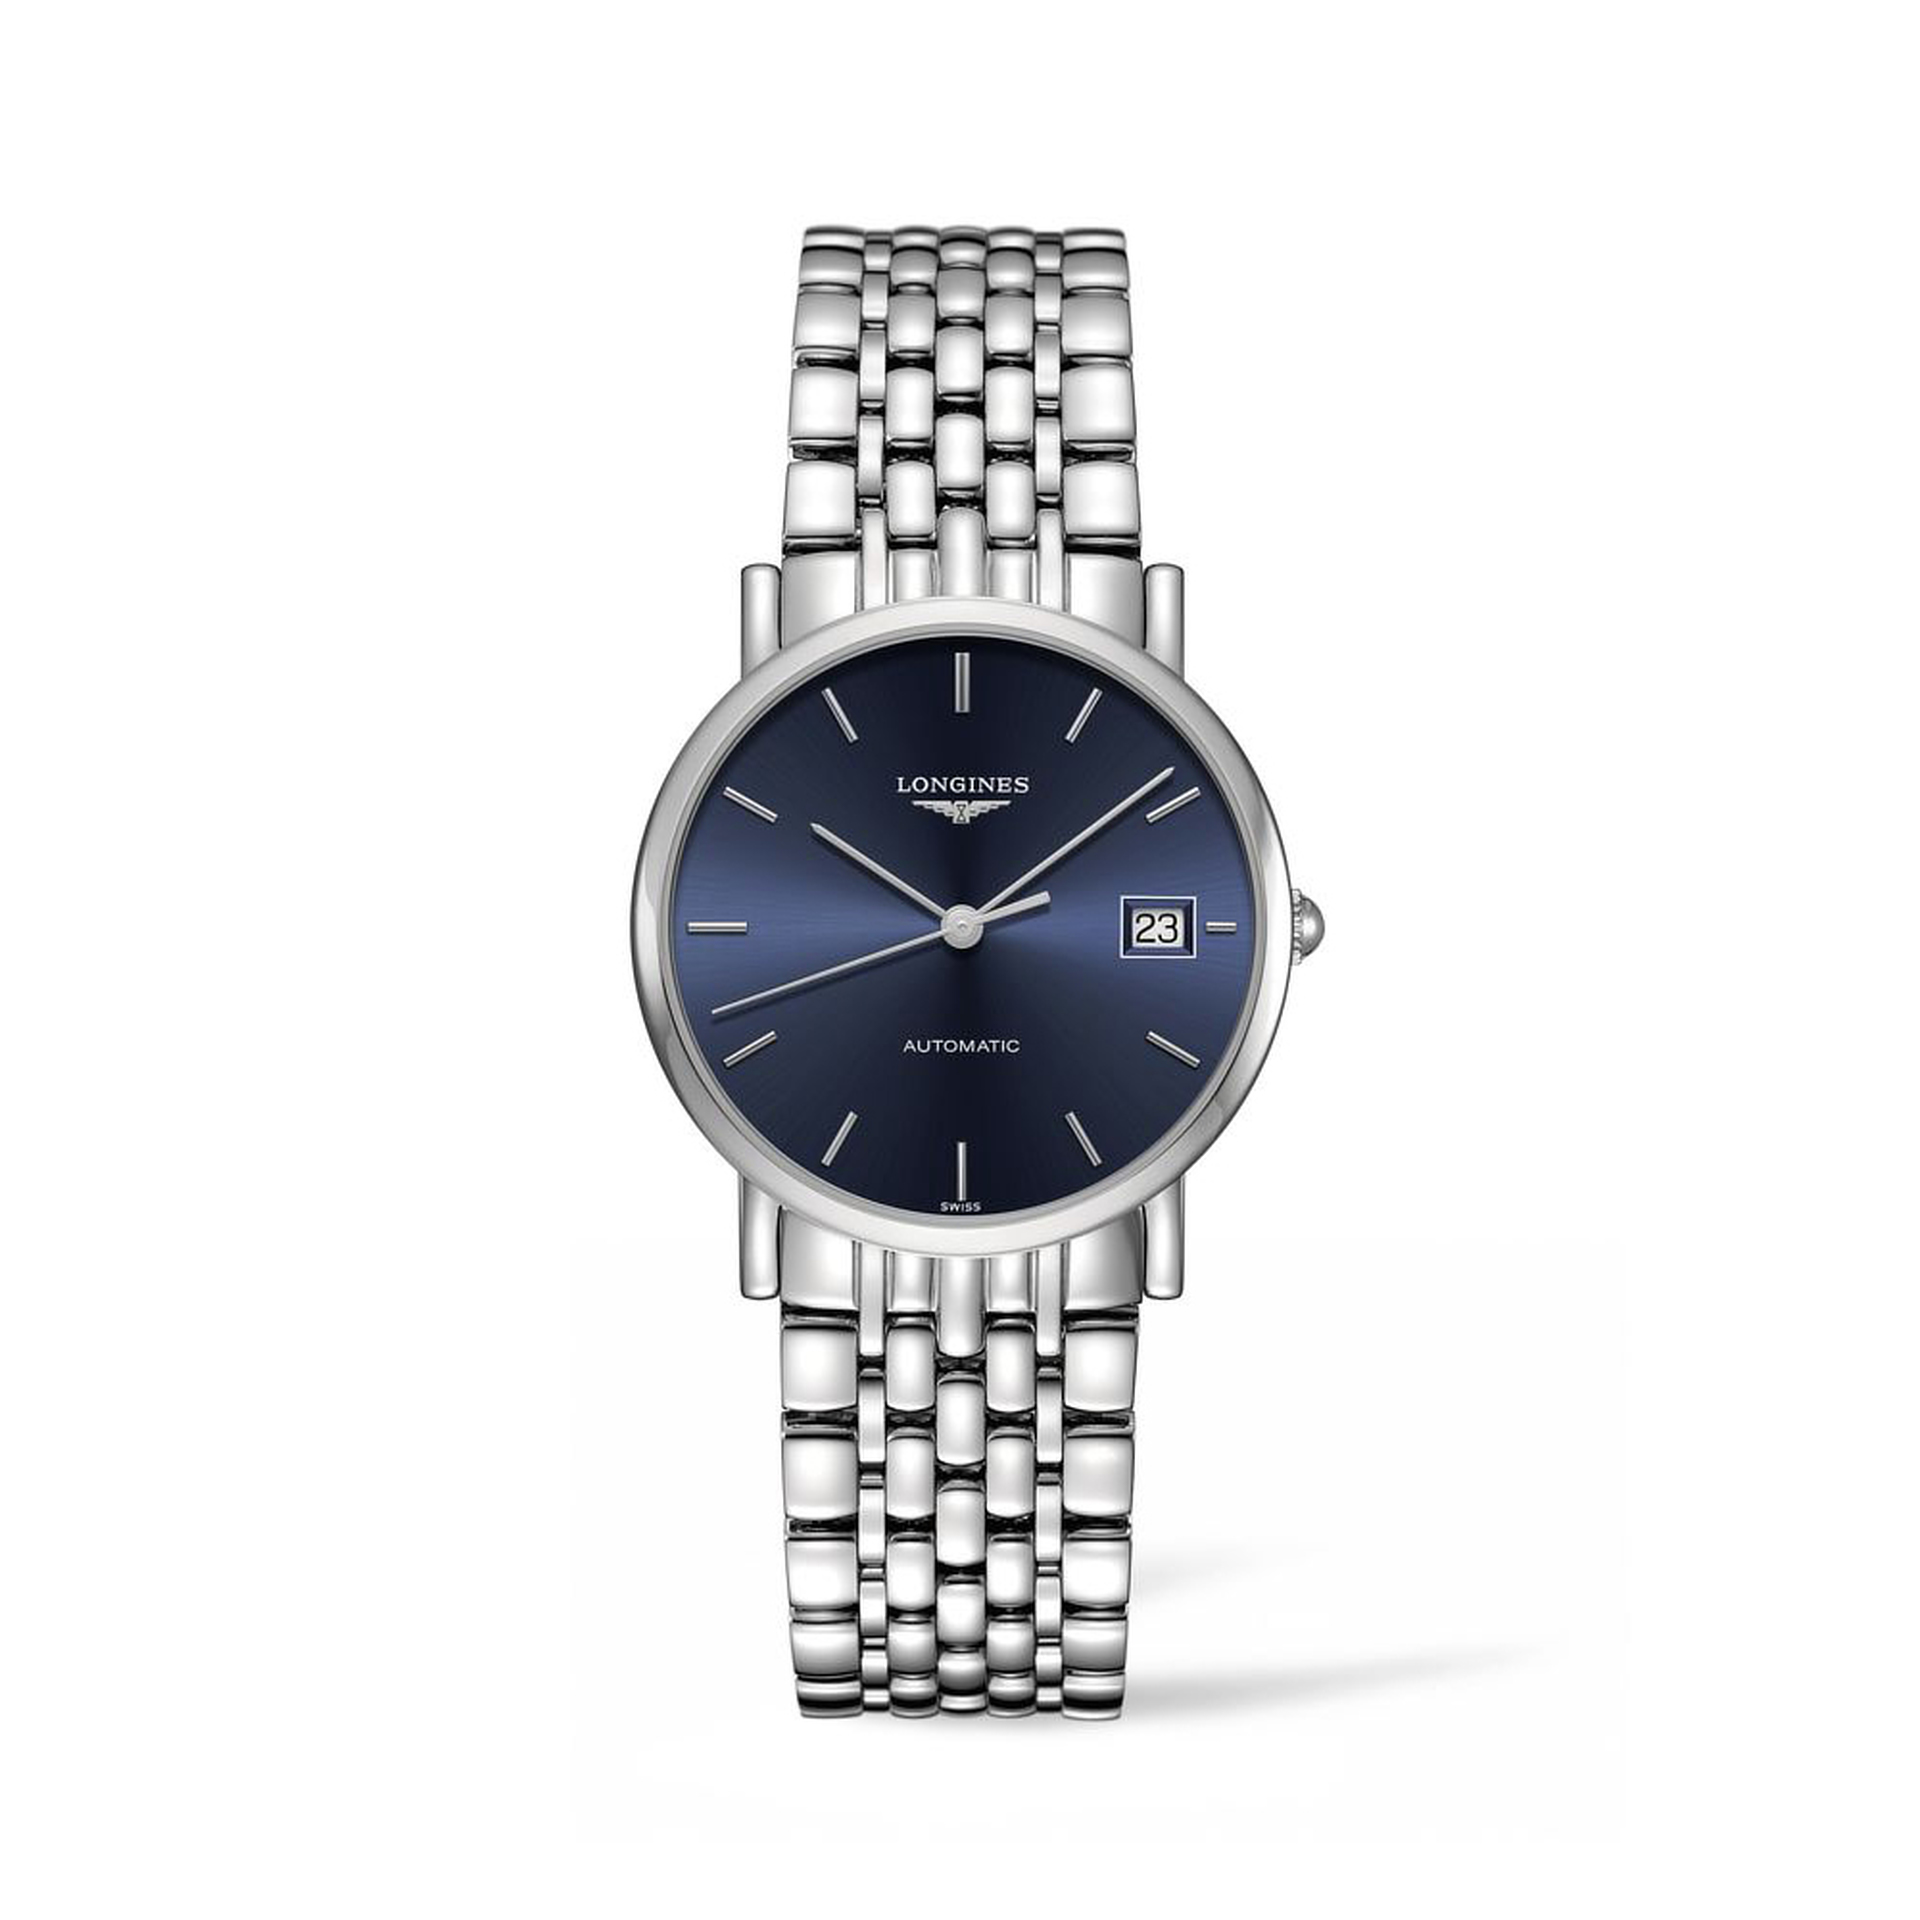 Longines Elegant 34.5mm blue baton dial with date at 3 on bracelet